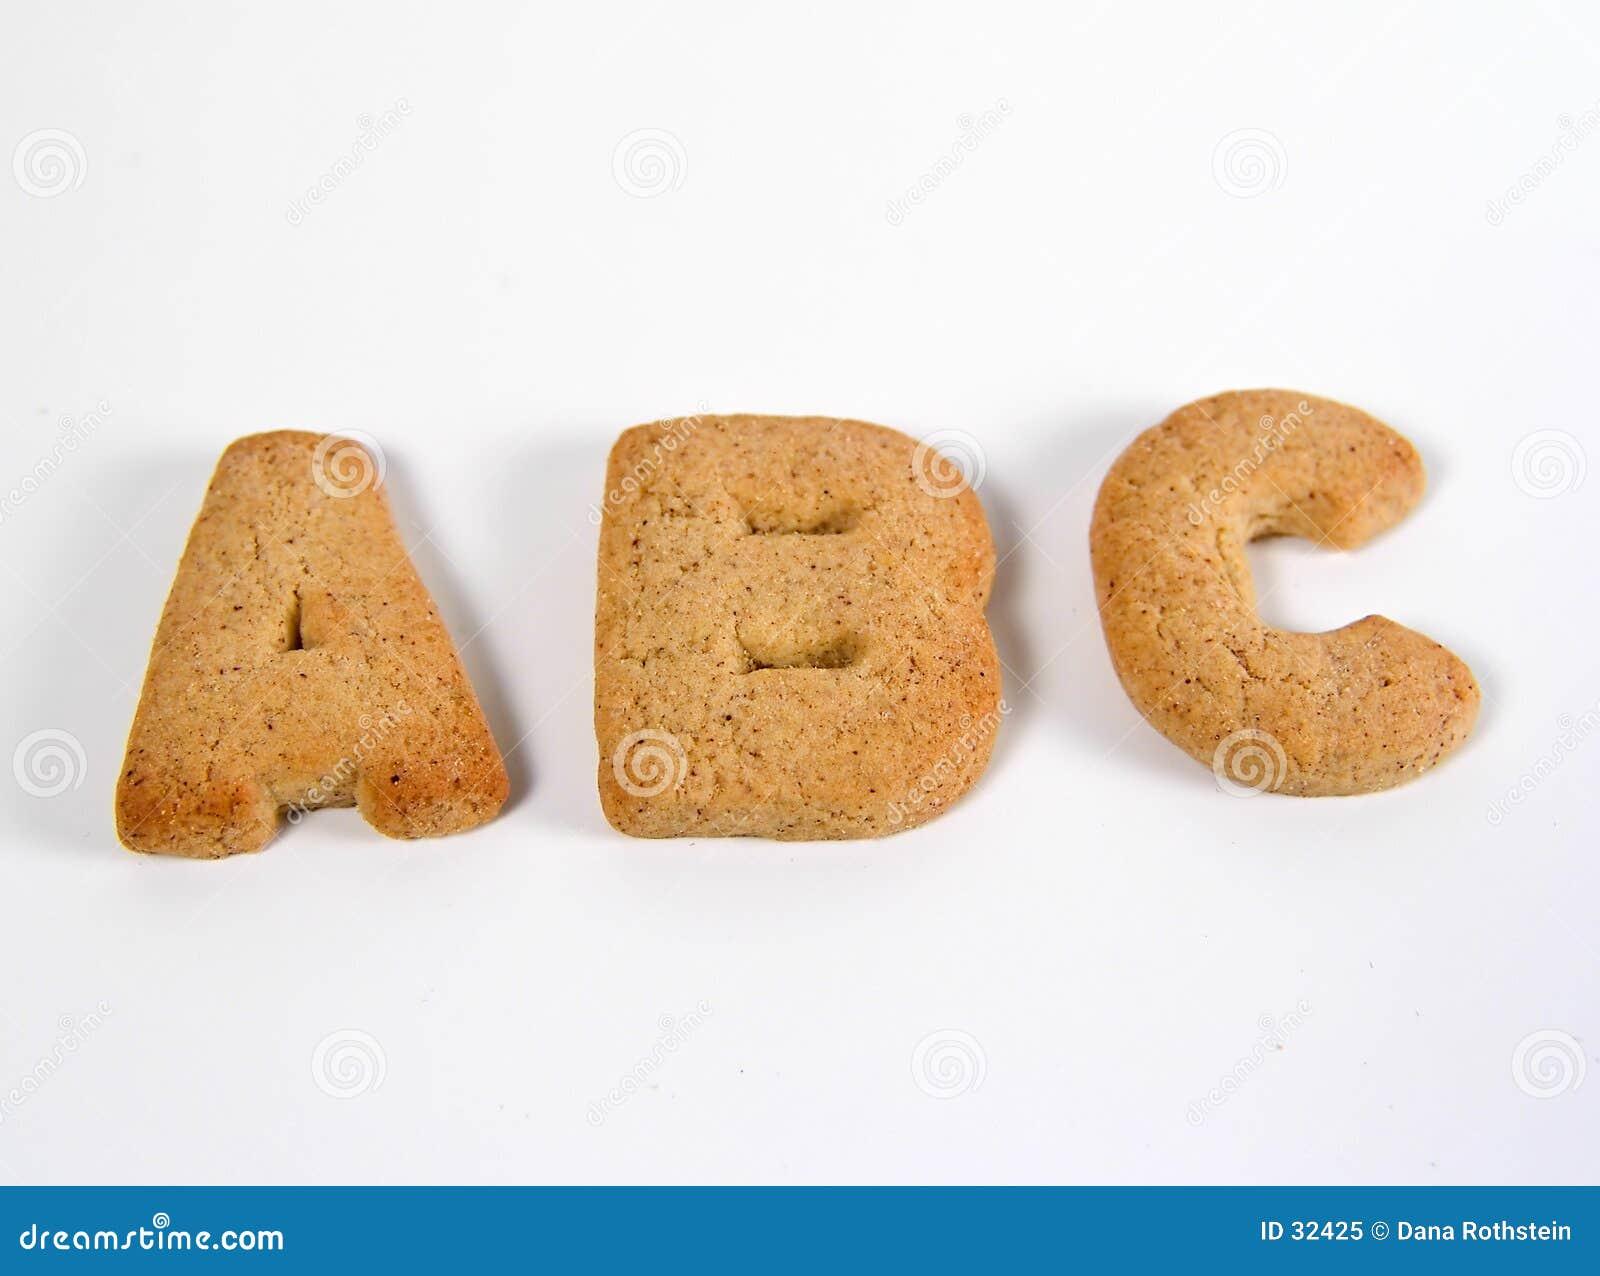 Abc-kakor